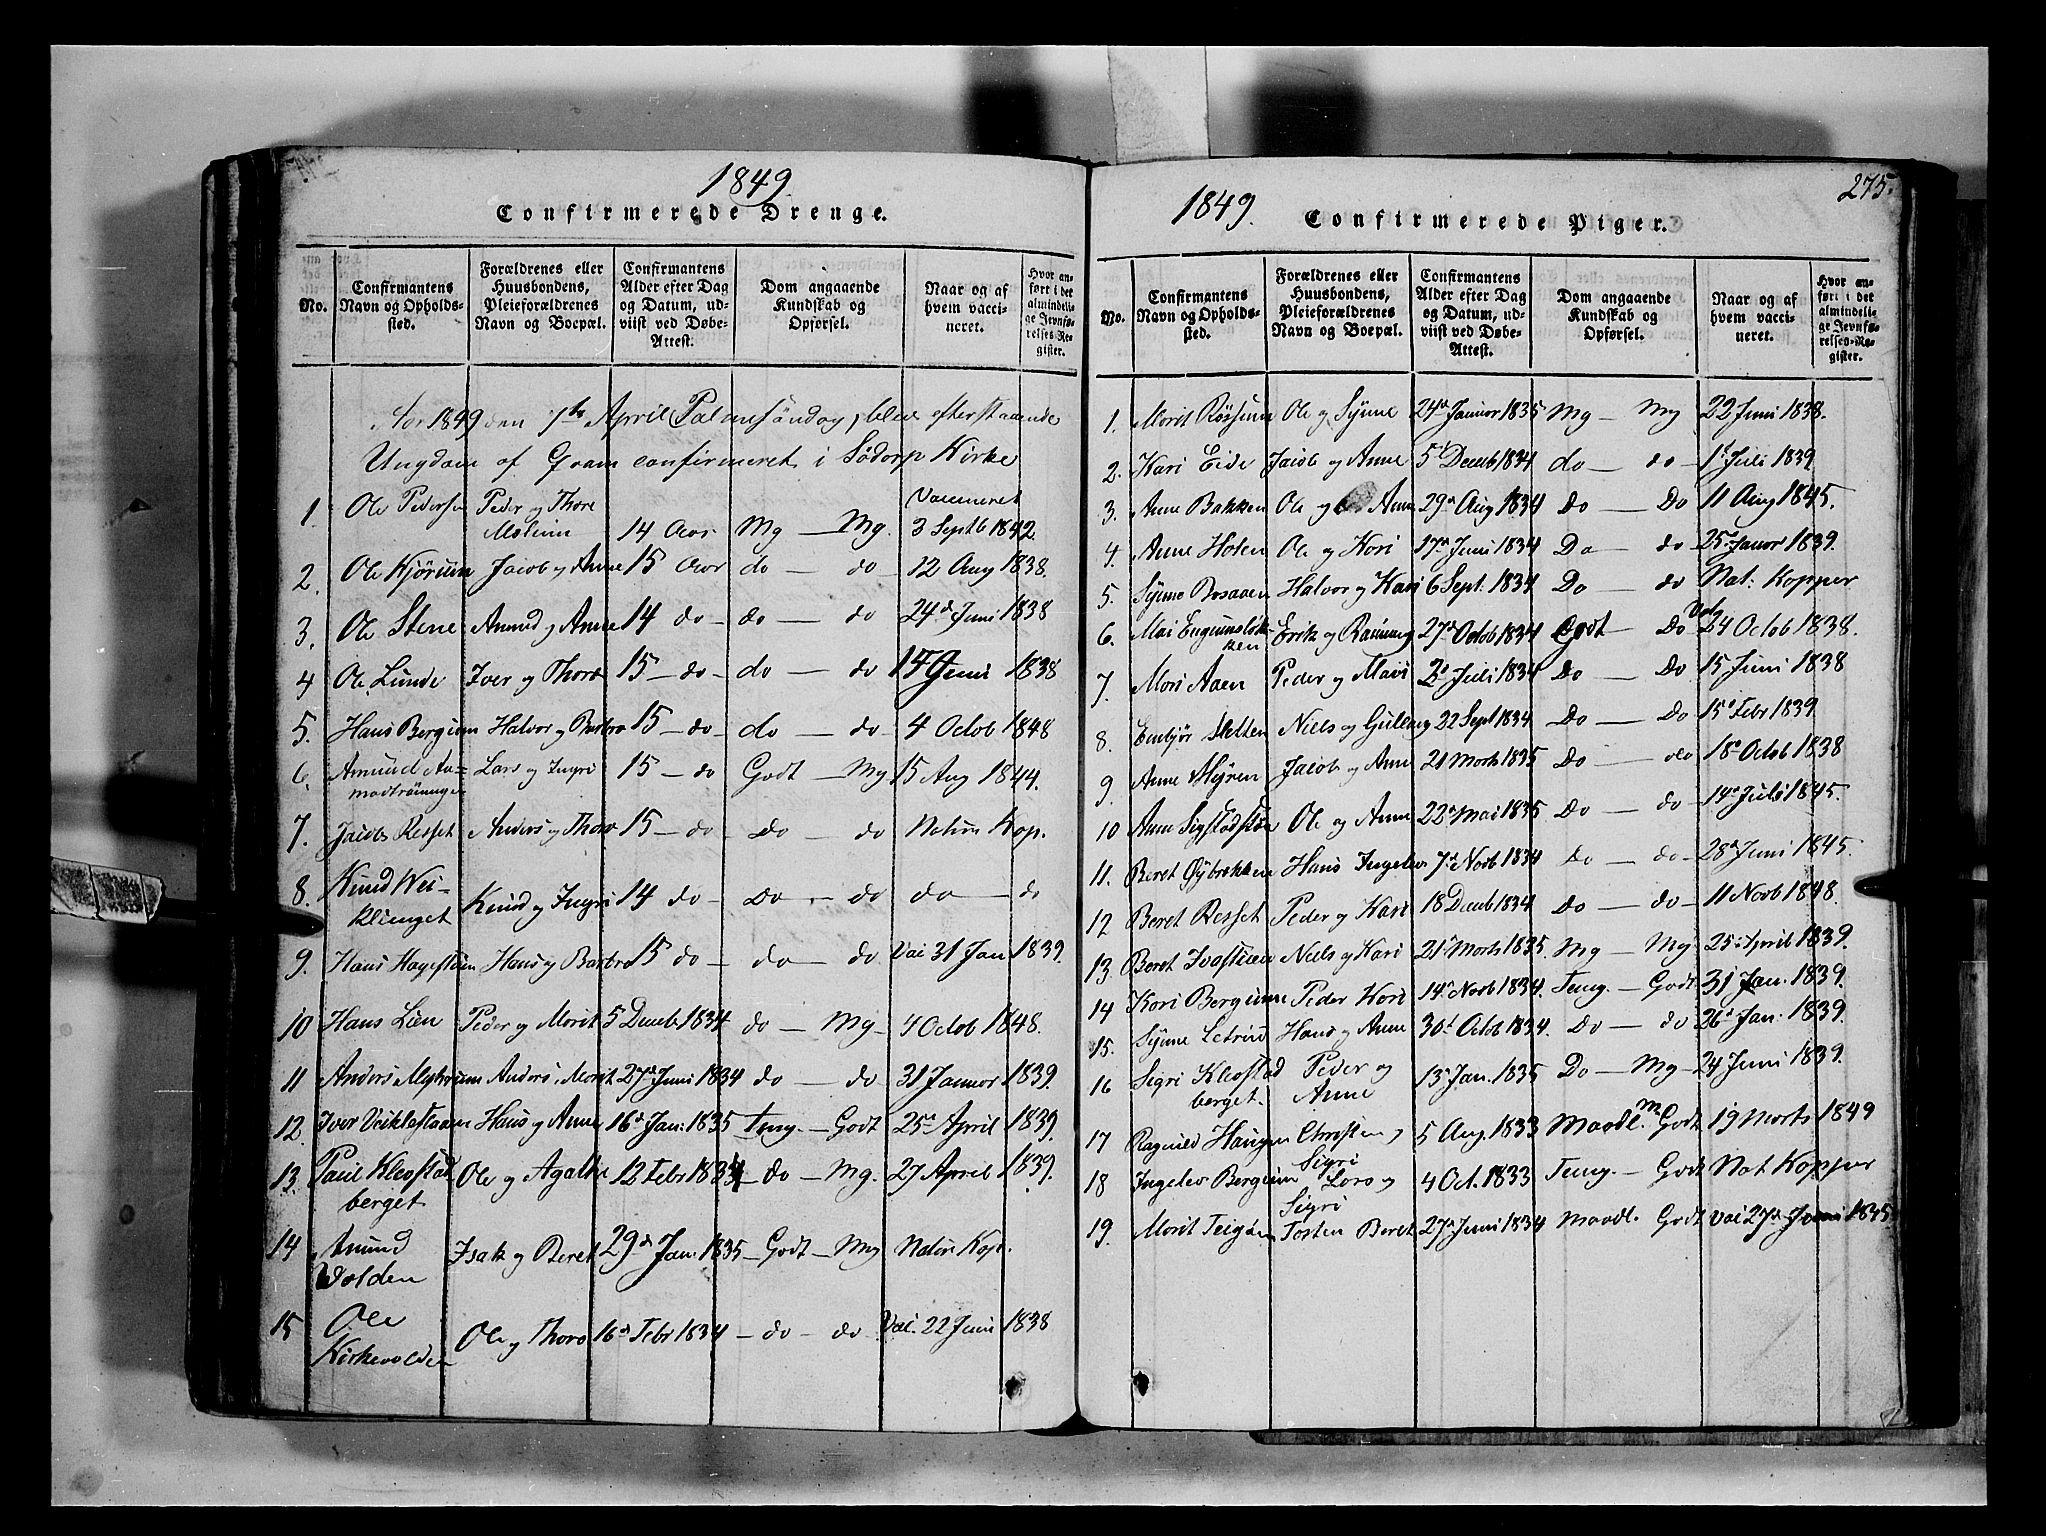 SAH, Fron prestekontor, H/Ha/Hab/L0002: Klokkerbok nr. 2, 1816-1850, s. 275